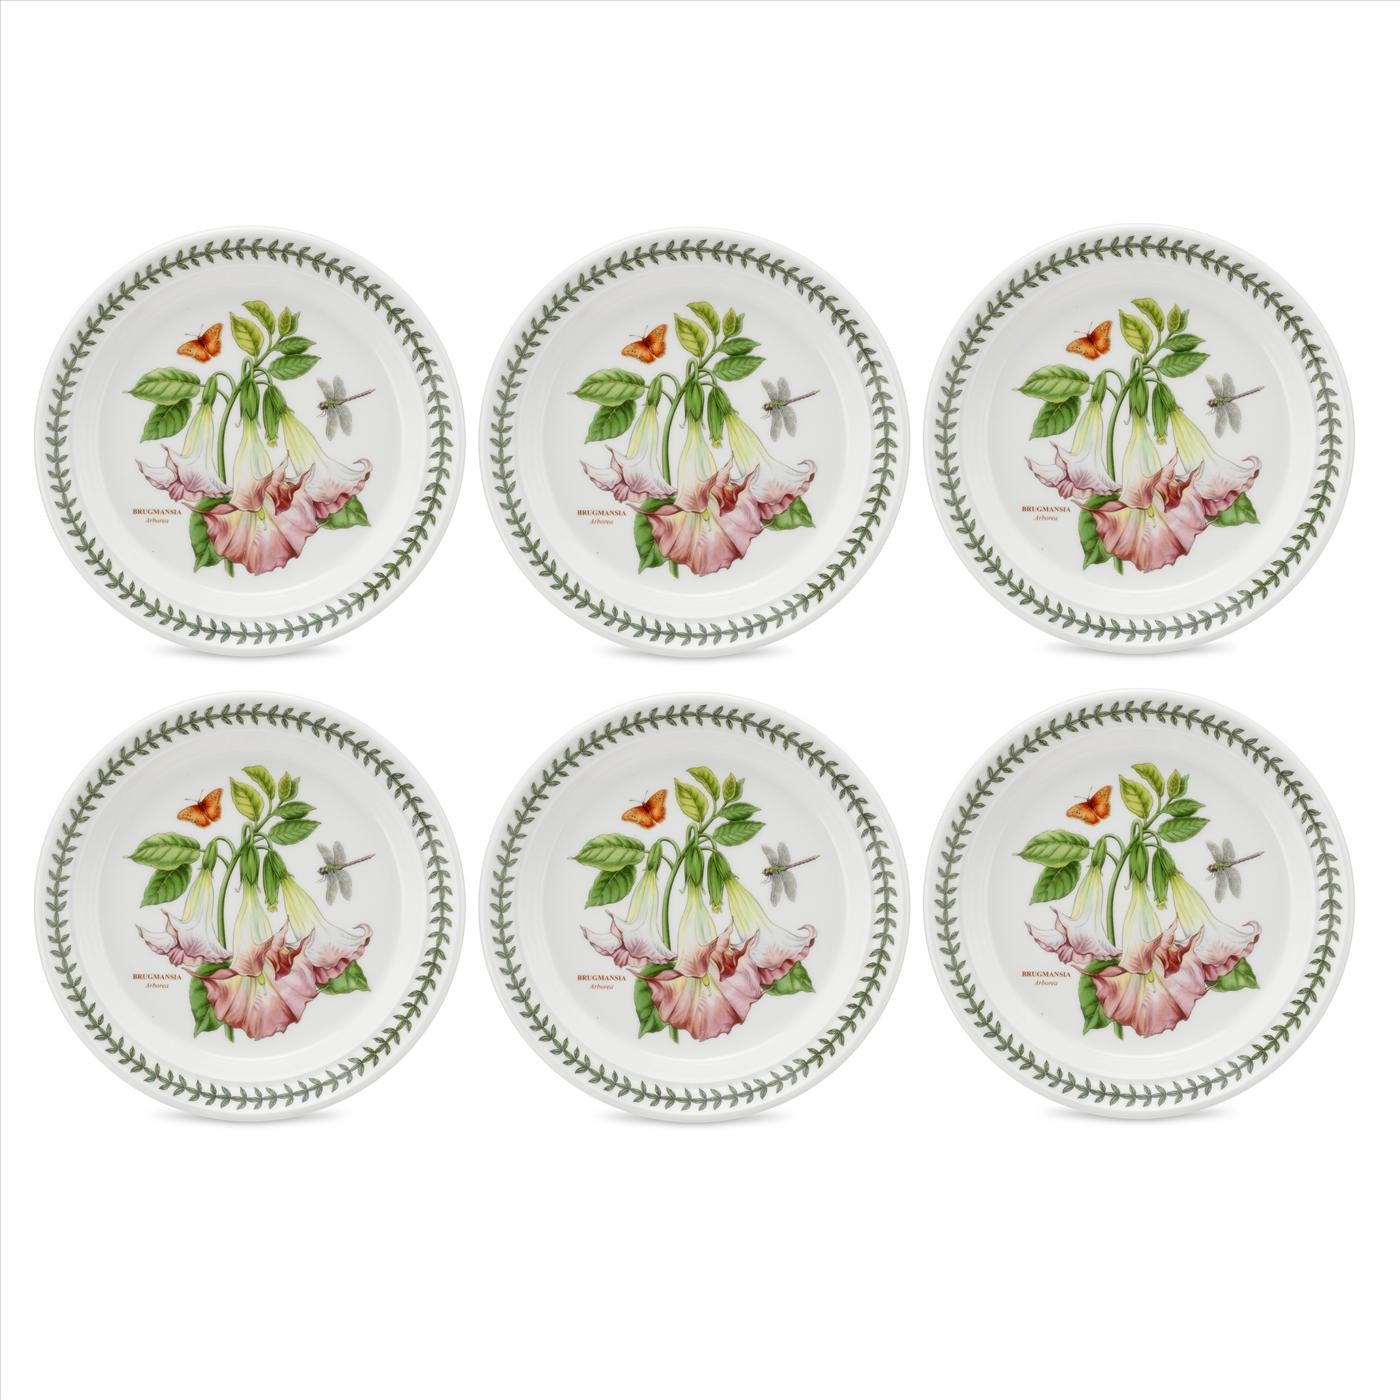 Portmeirion Exotic Botanic Garden Set of 6 Arborea Dinner Plates.